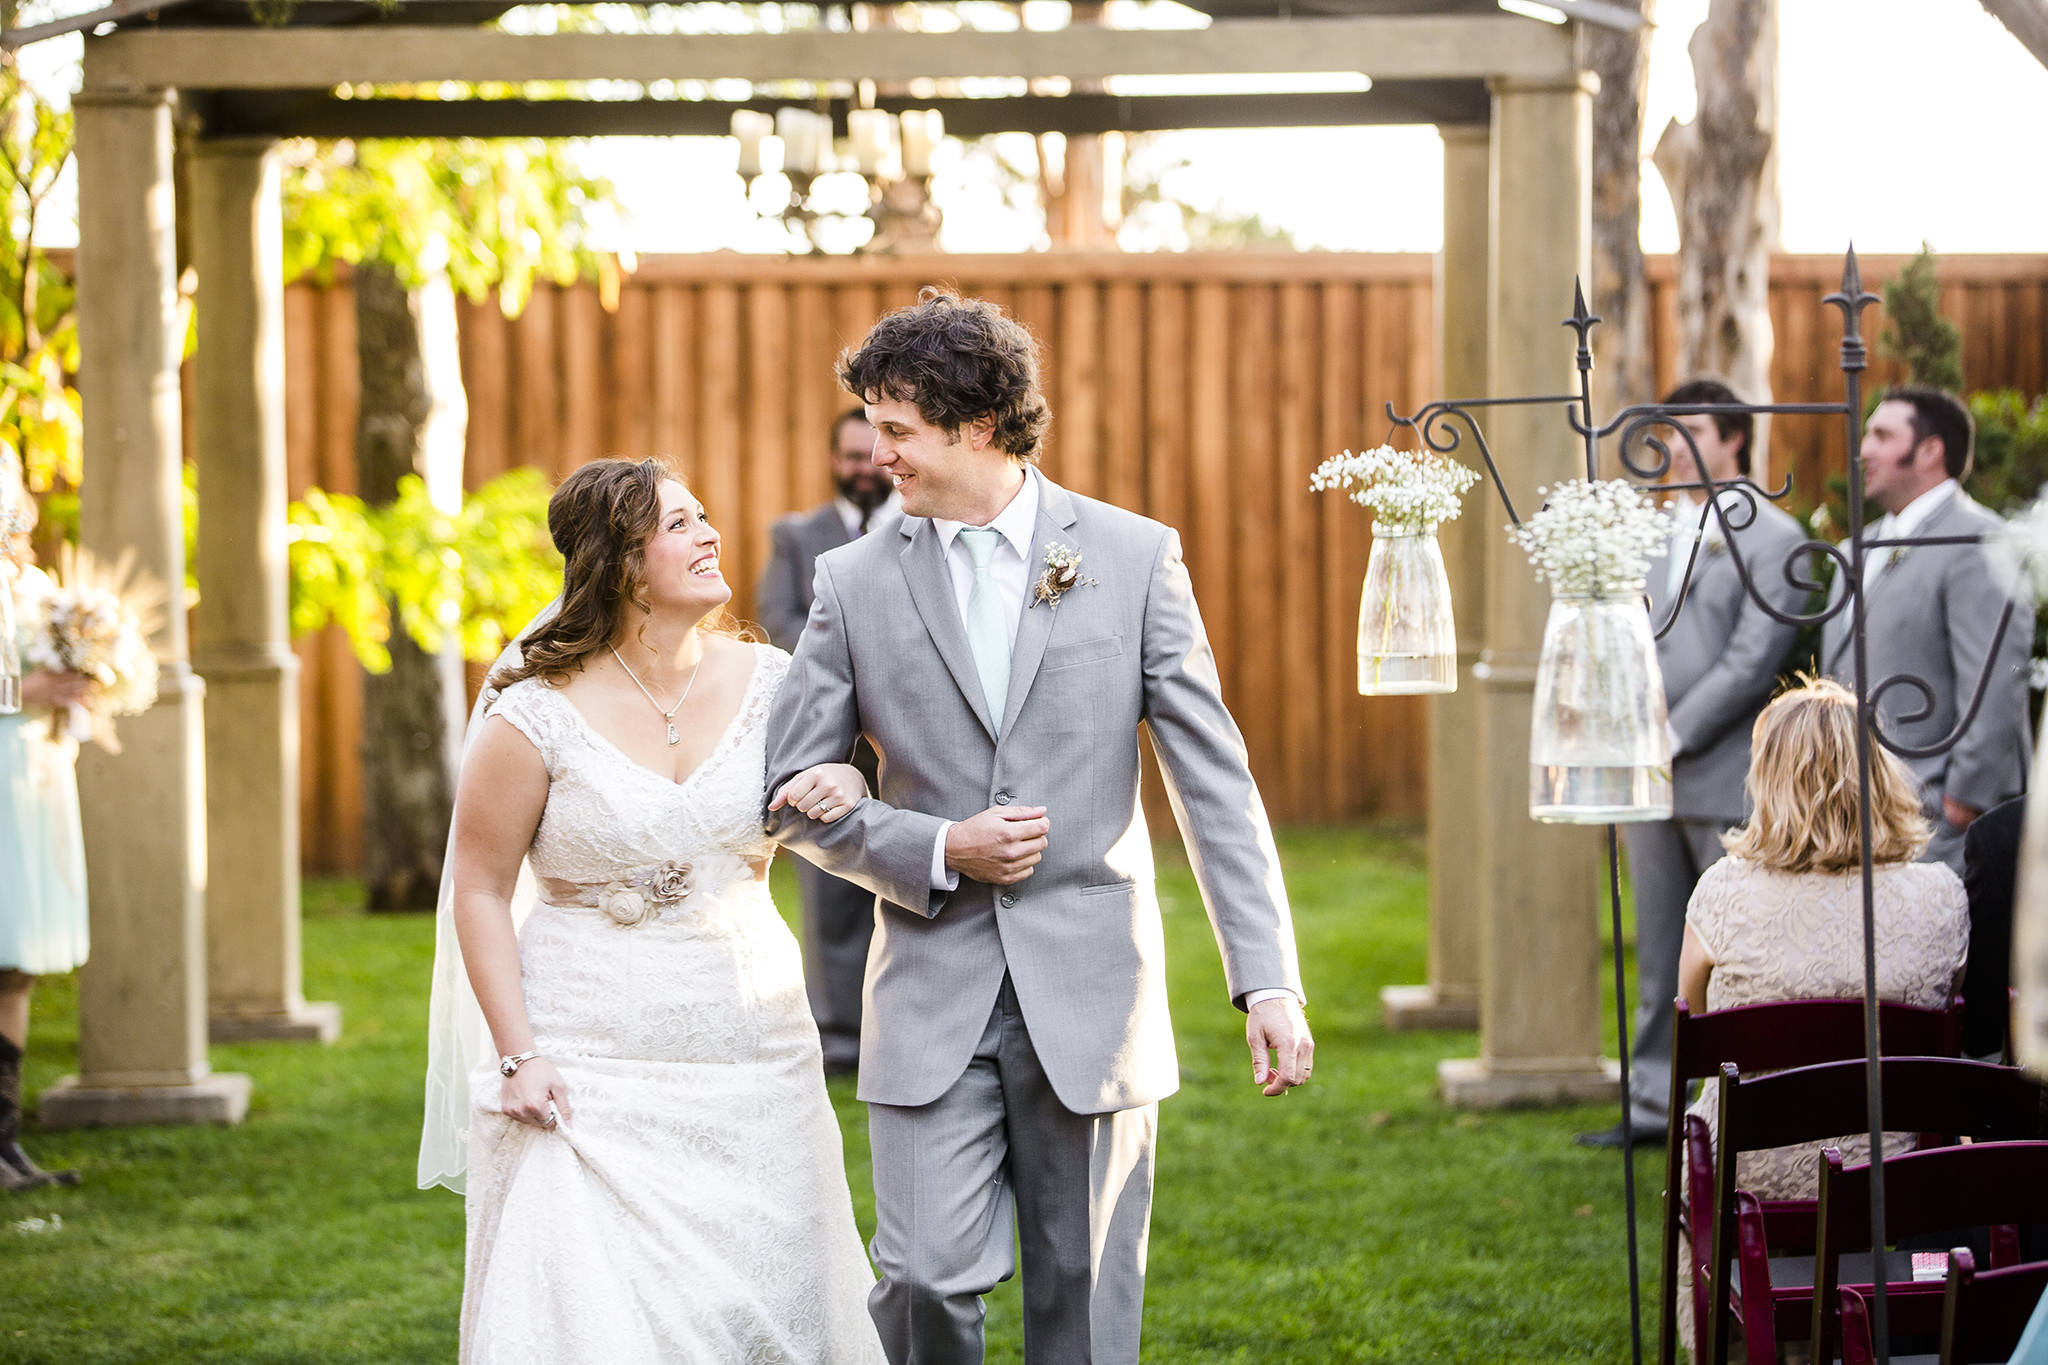 Lubbock Wedding Photography Wedding Photographer Walnut Tree Bride and Groom Exit